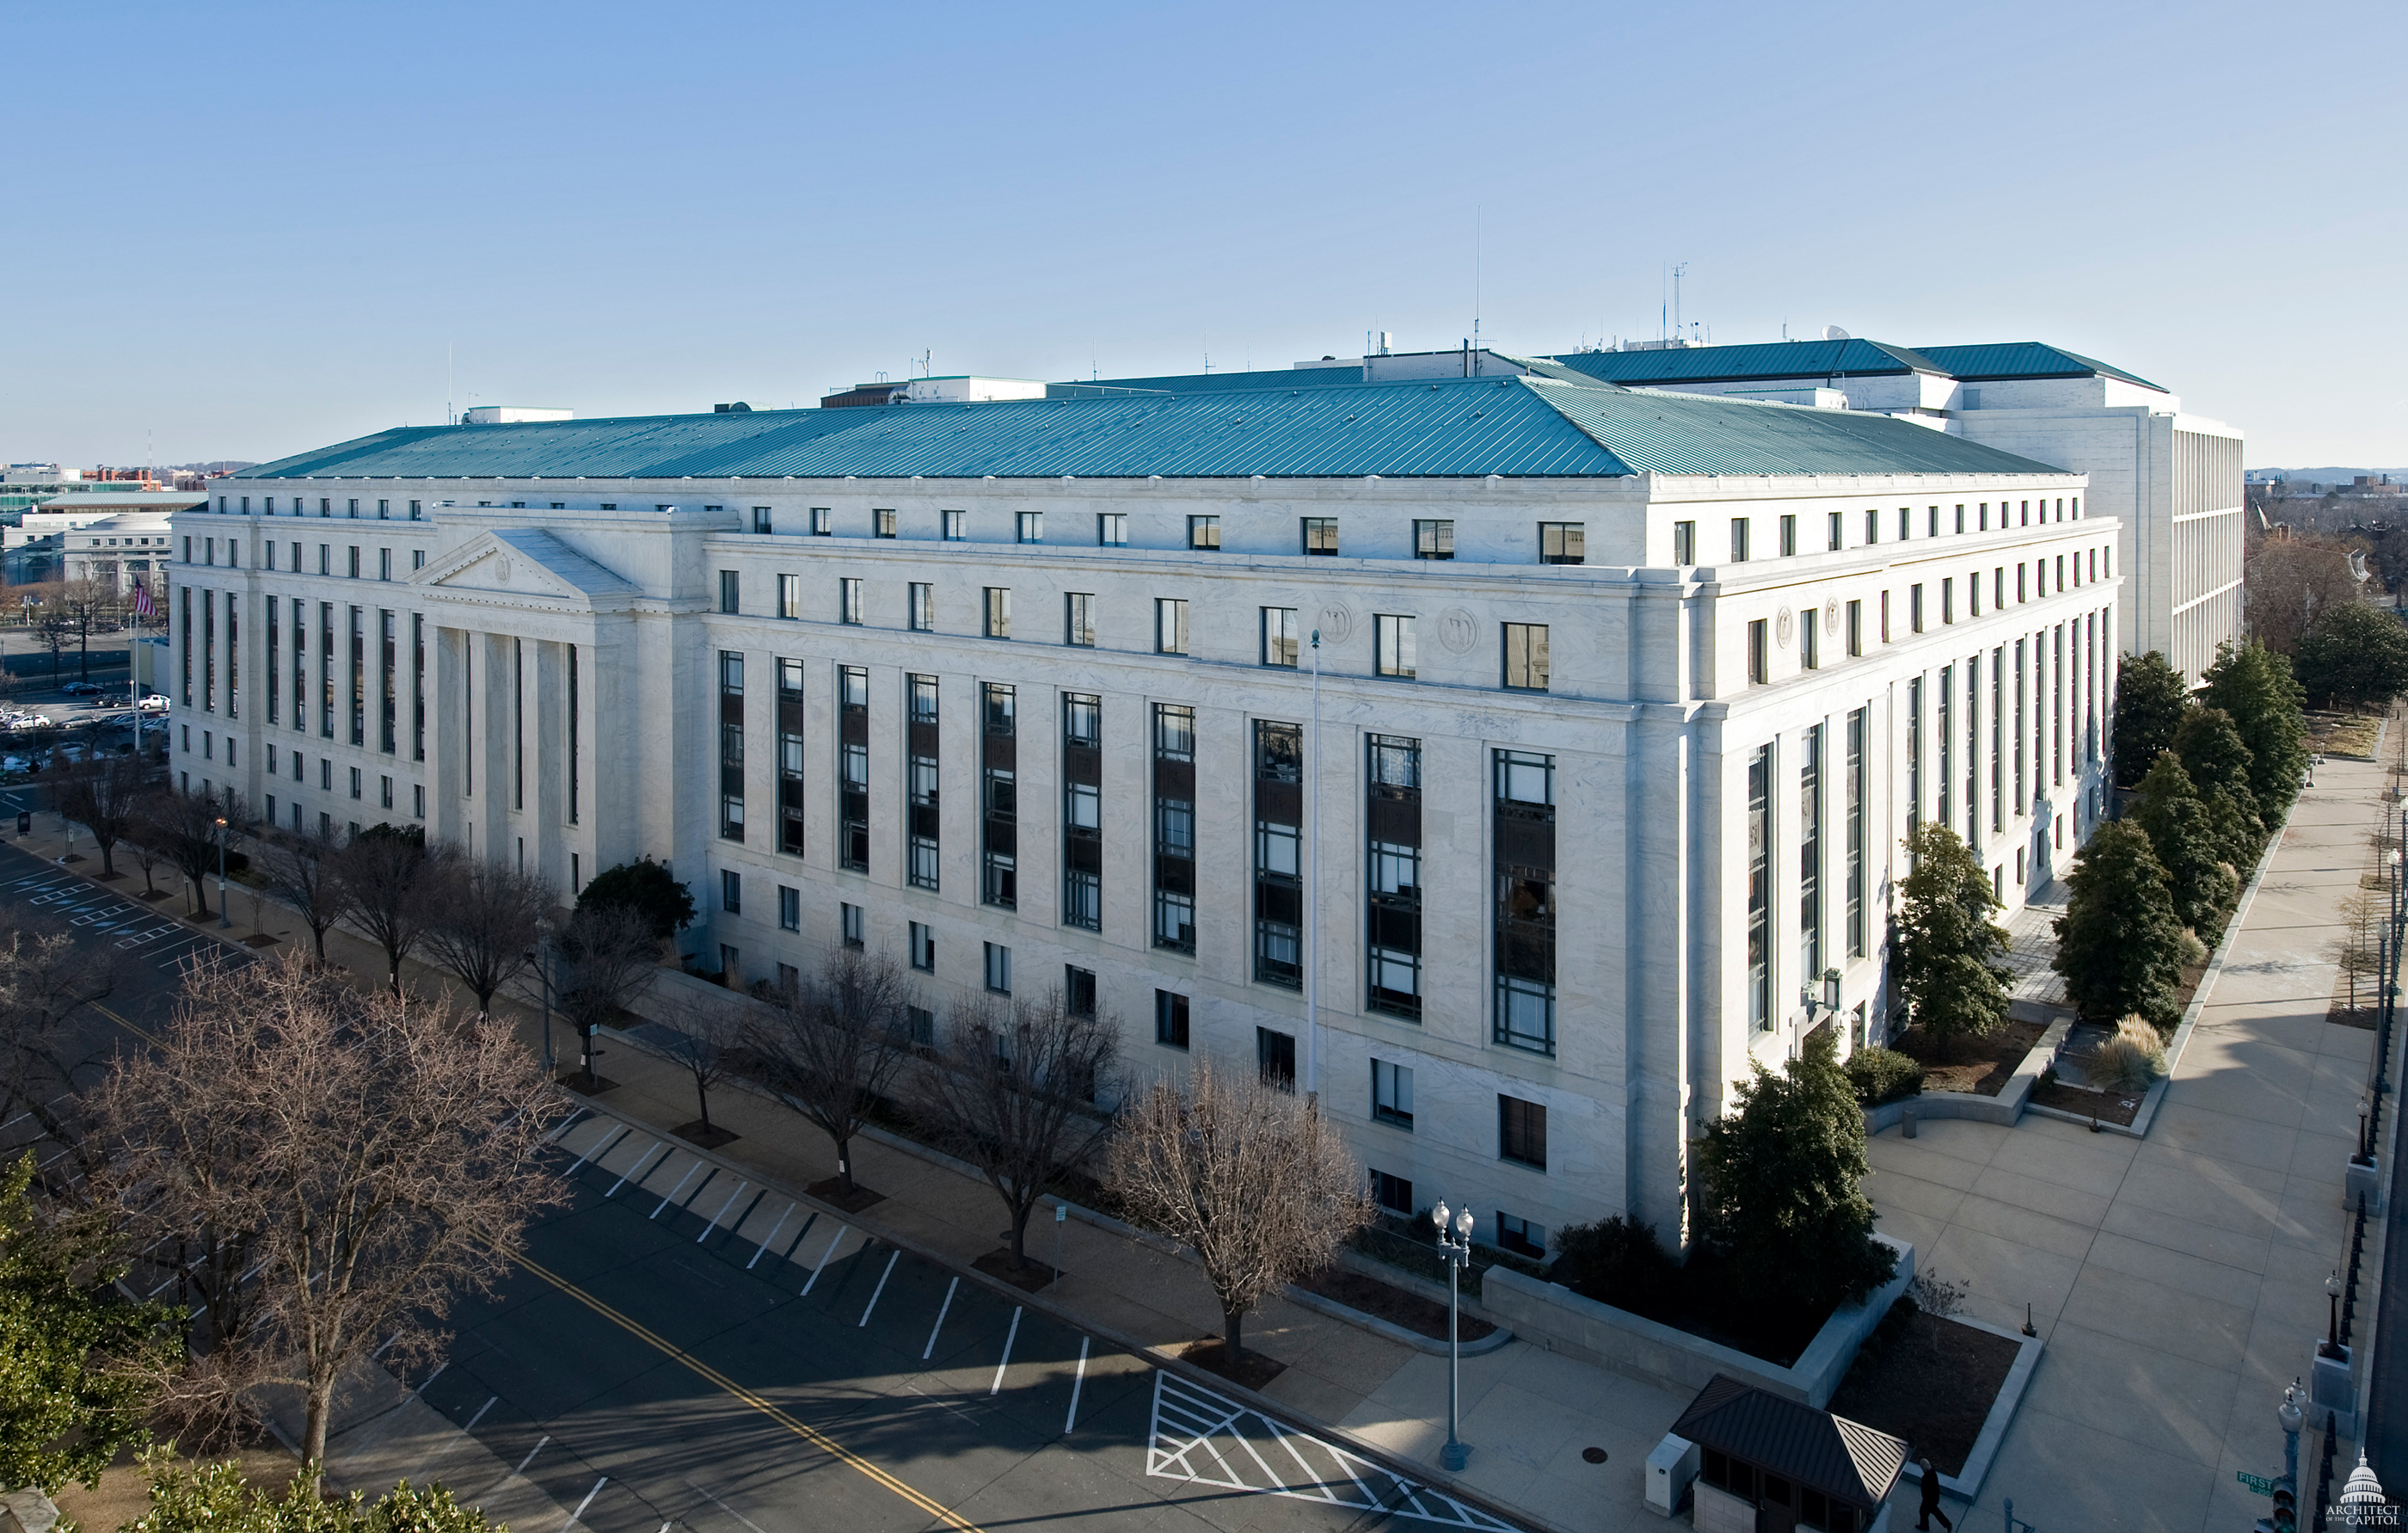 Cool Architecture Office Buildings senate office buildings   architect of the capitol   united states